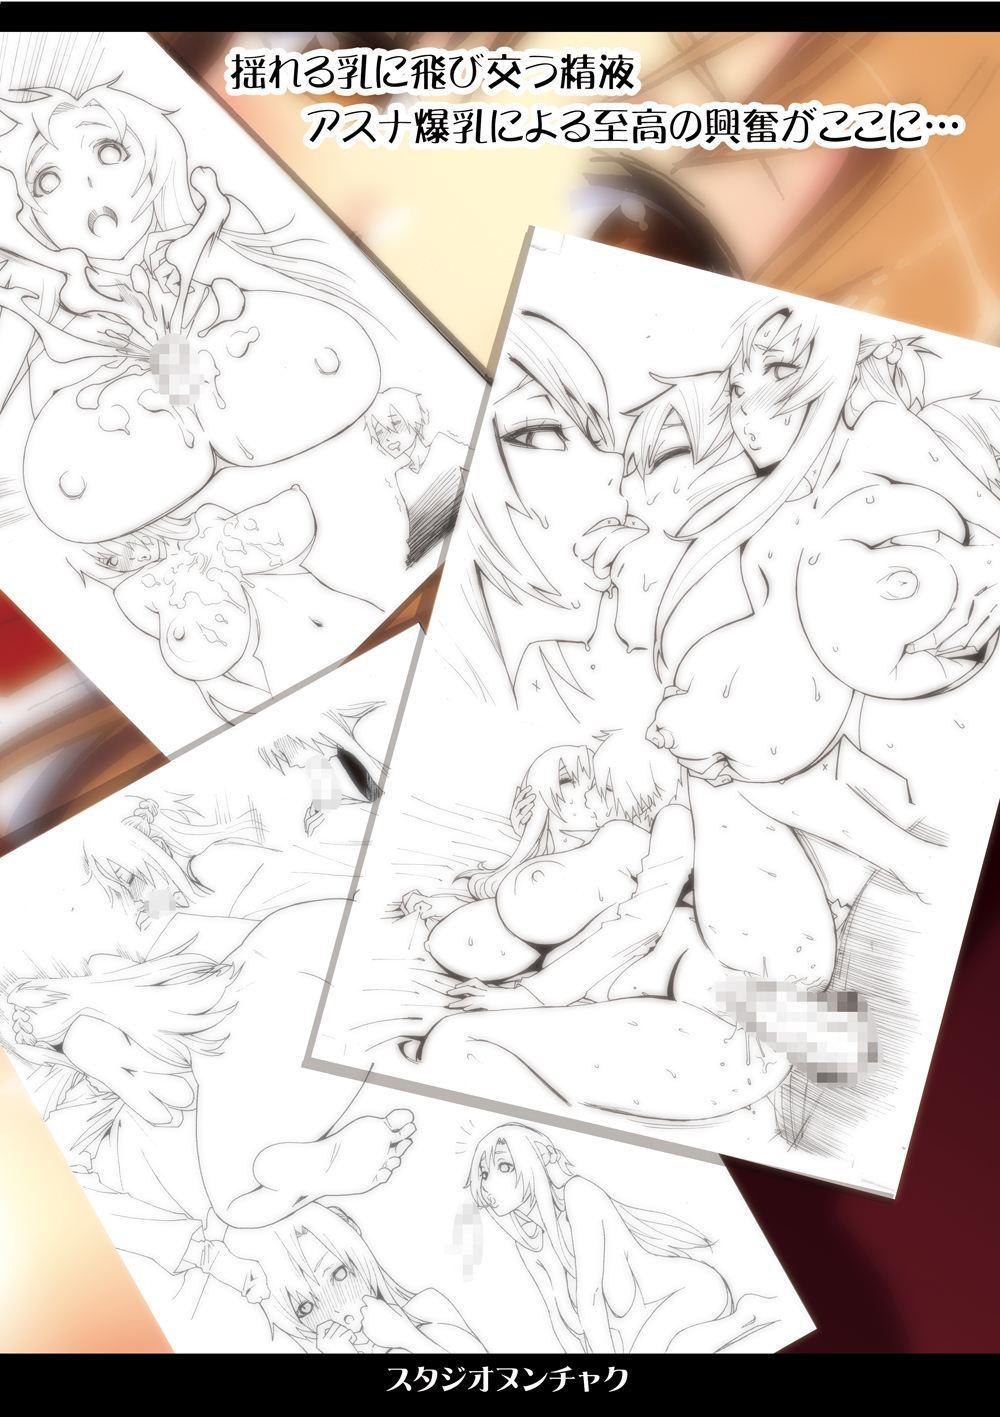 Asuna o Bakunyuu ni Shite Mita | I Gave Asuna Giant Tits 1